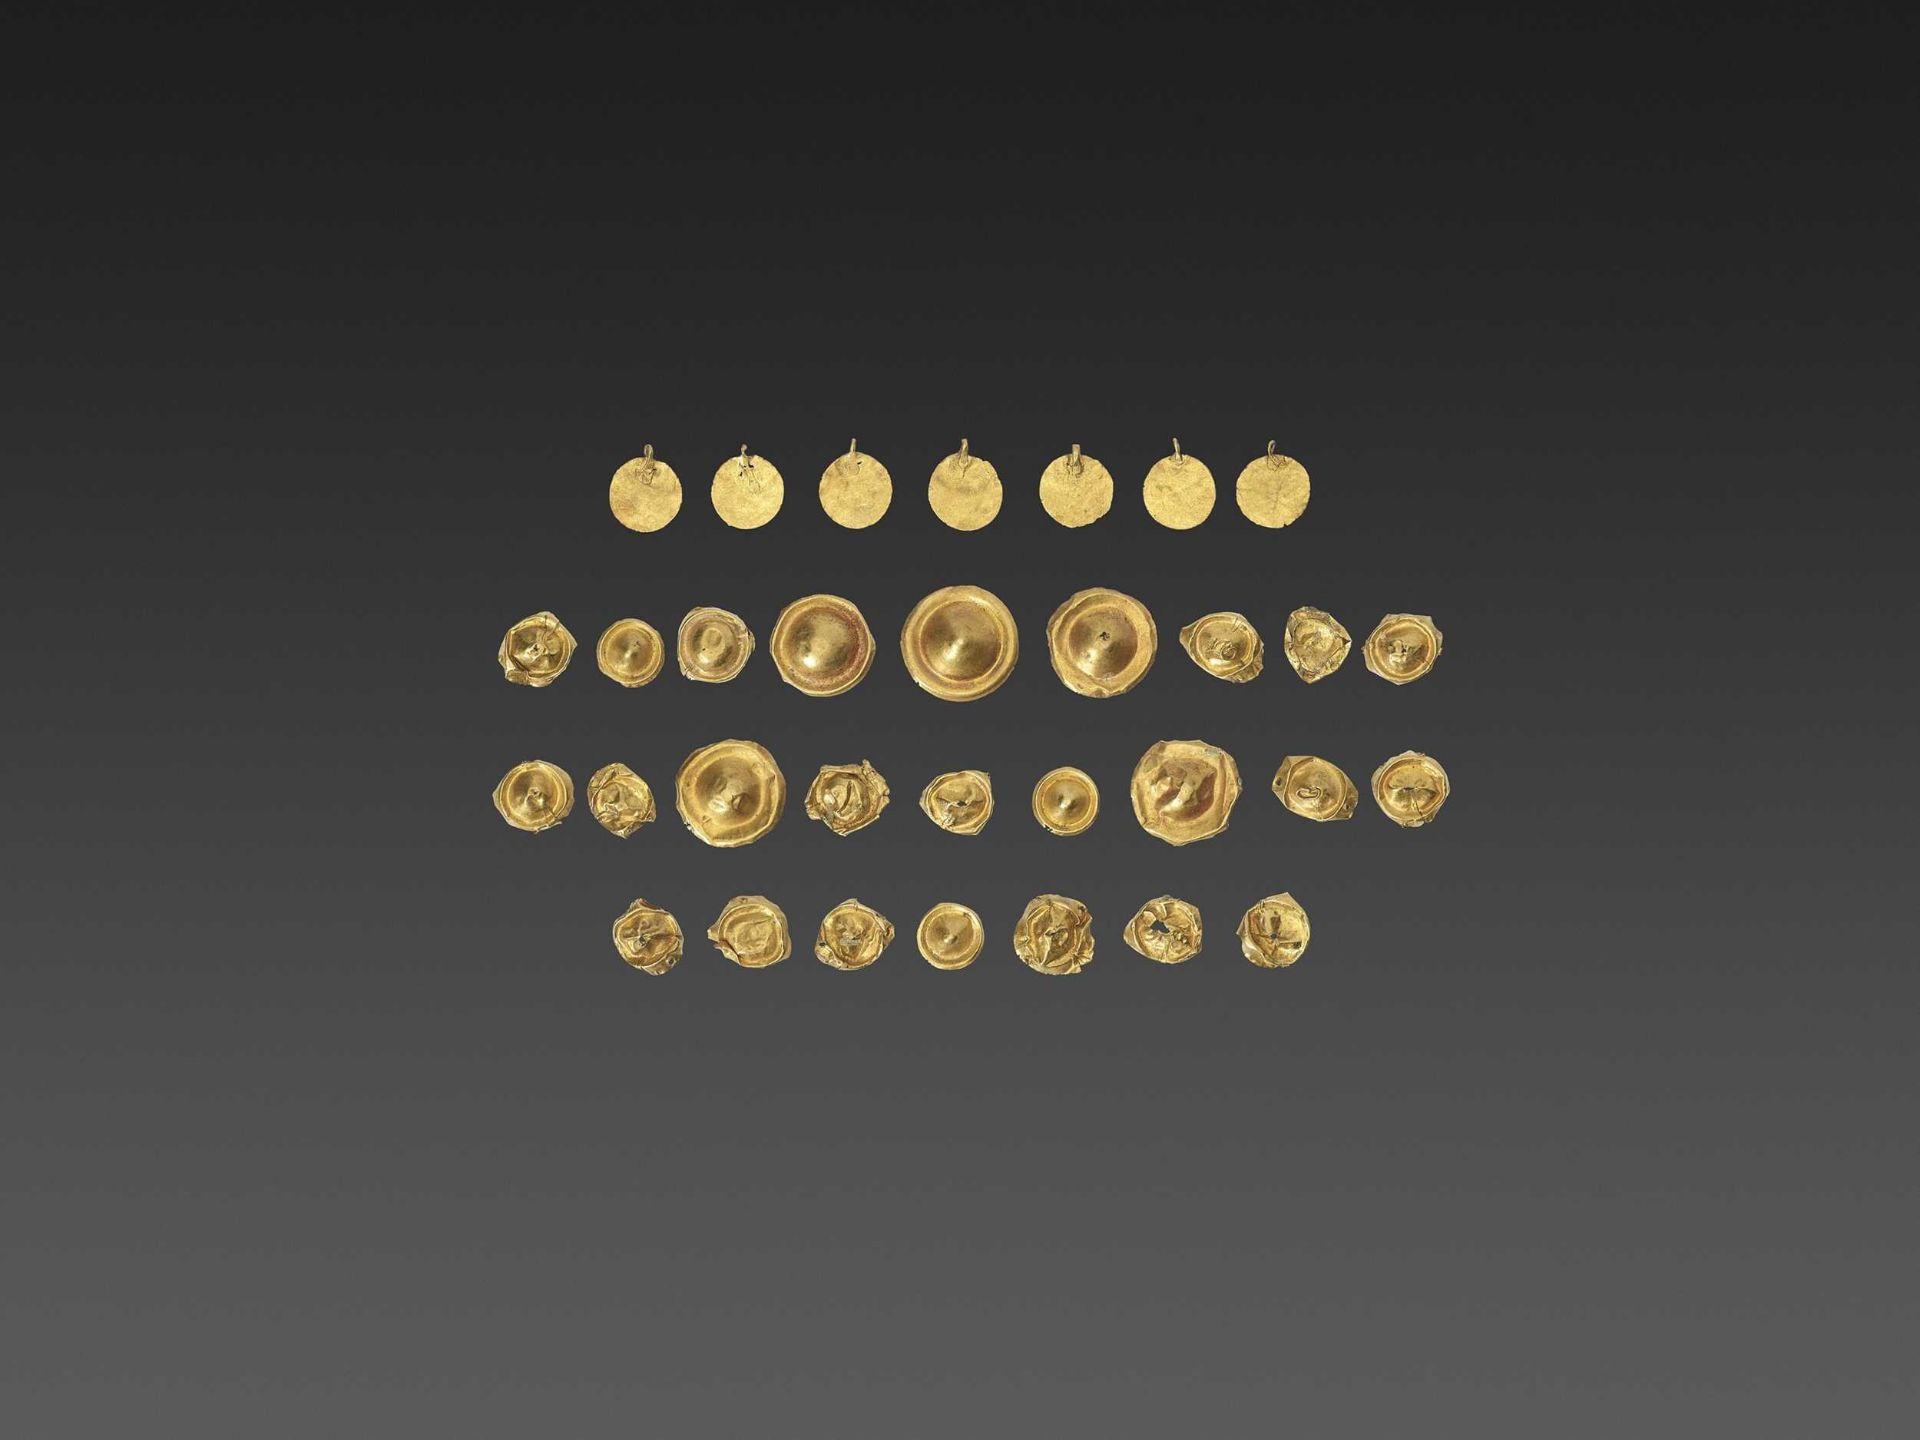 32 BACTRIAN GOLD GARM ENT ORNAMENTS